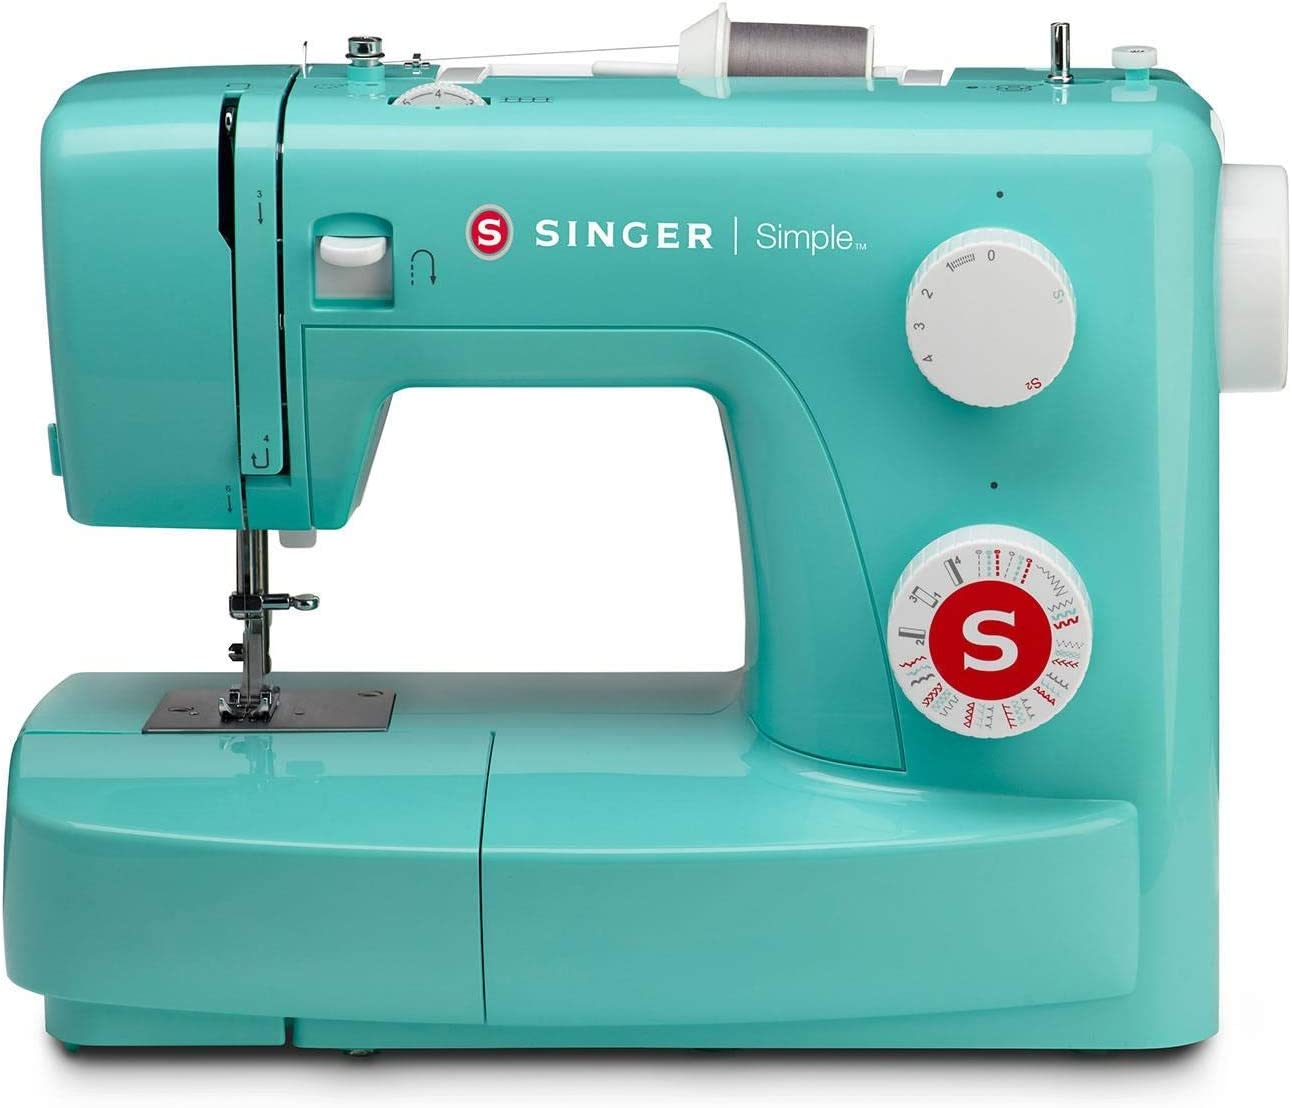 SINGER Simple 3223G - Máquina de coser (Turquesa, Máquina de coser semiautomática, Costura, Paso 4, Giratorio, Zigzag)